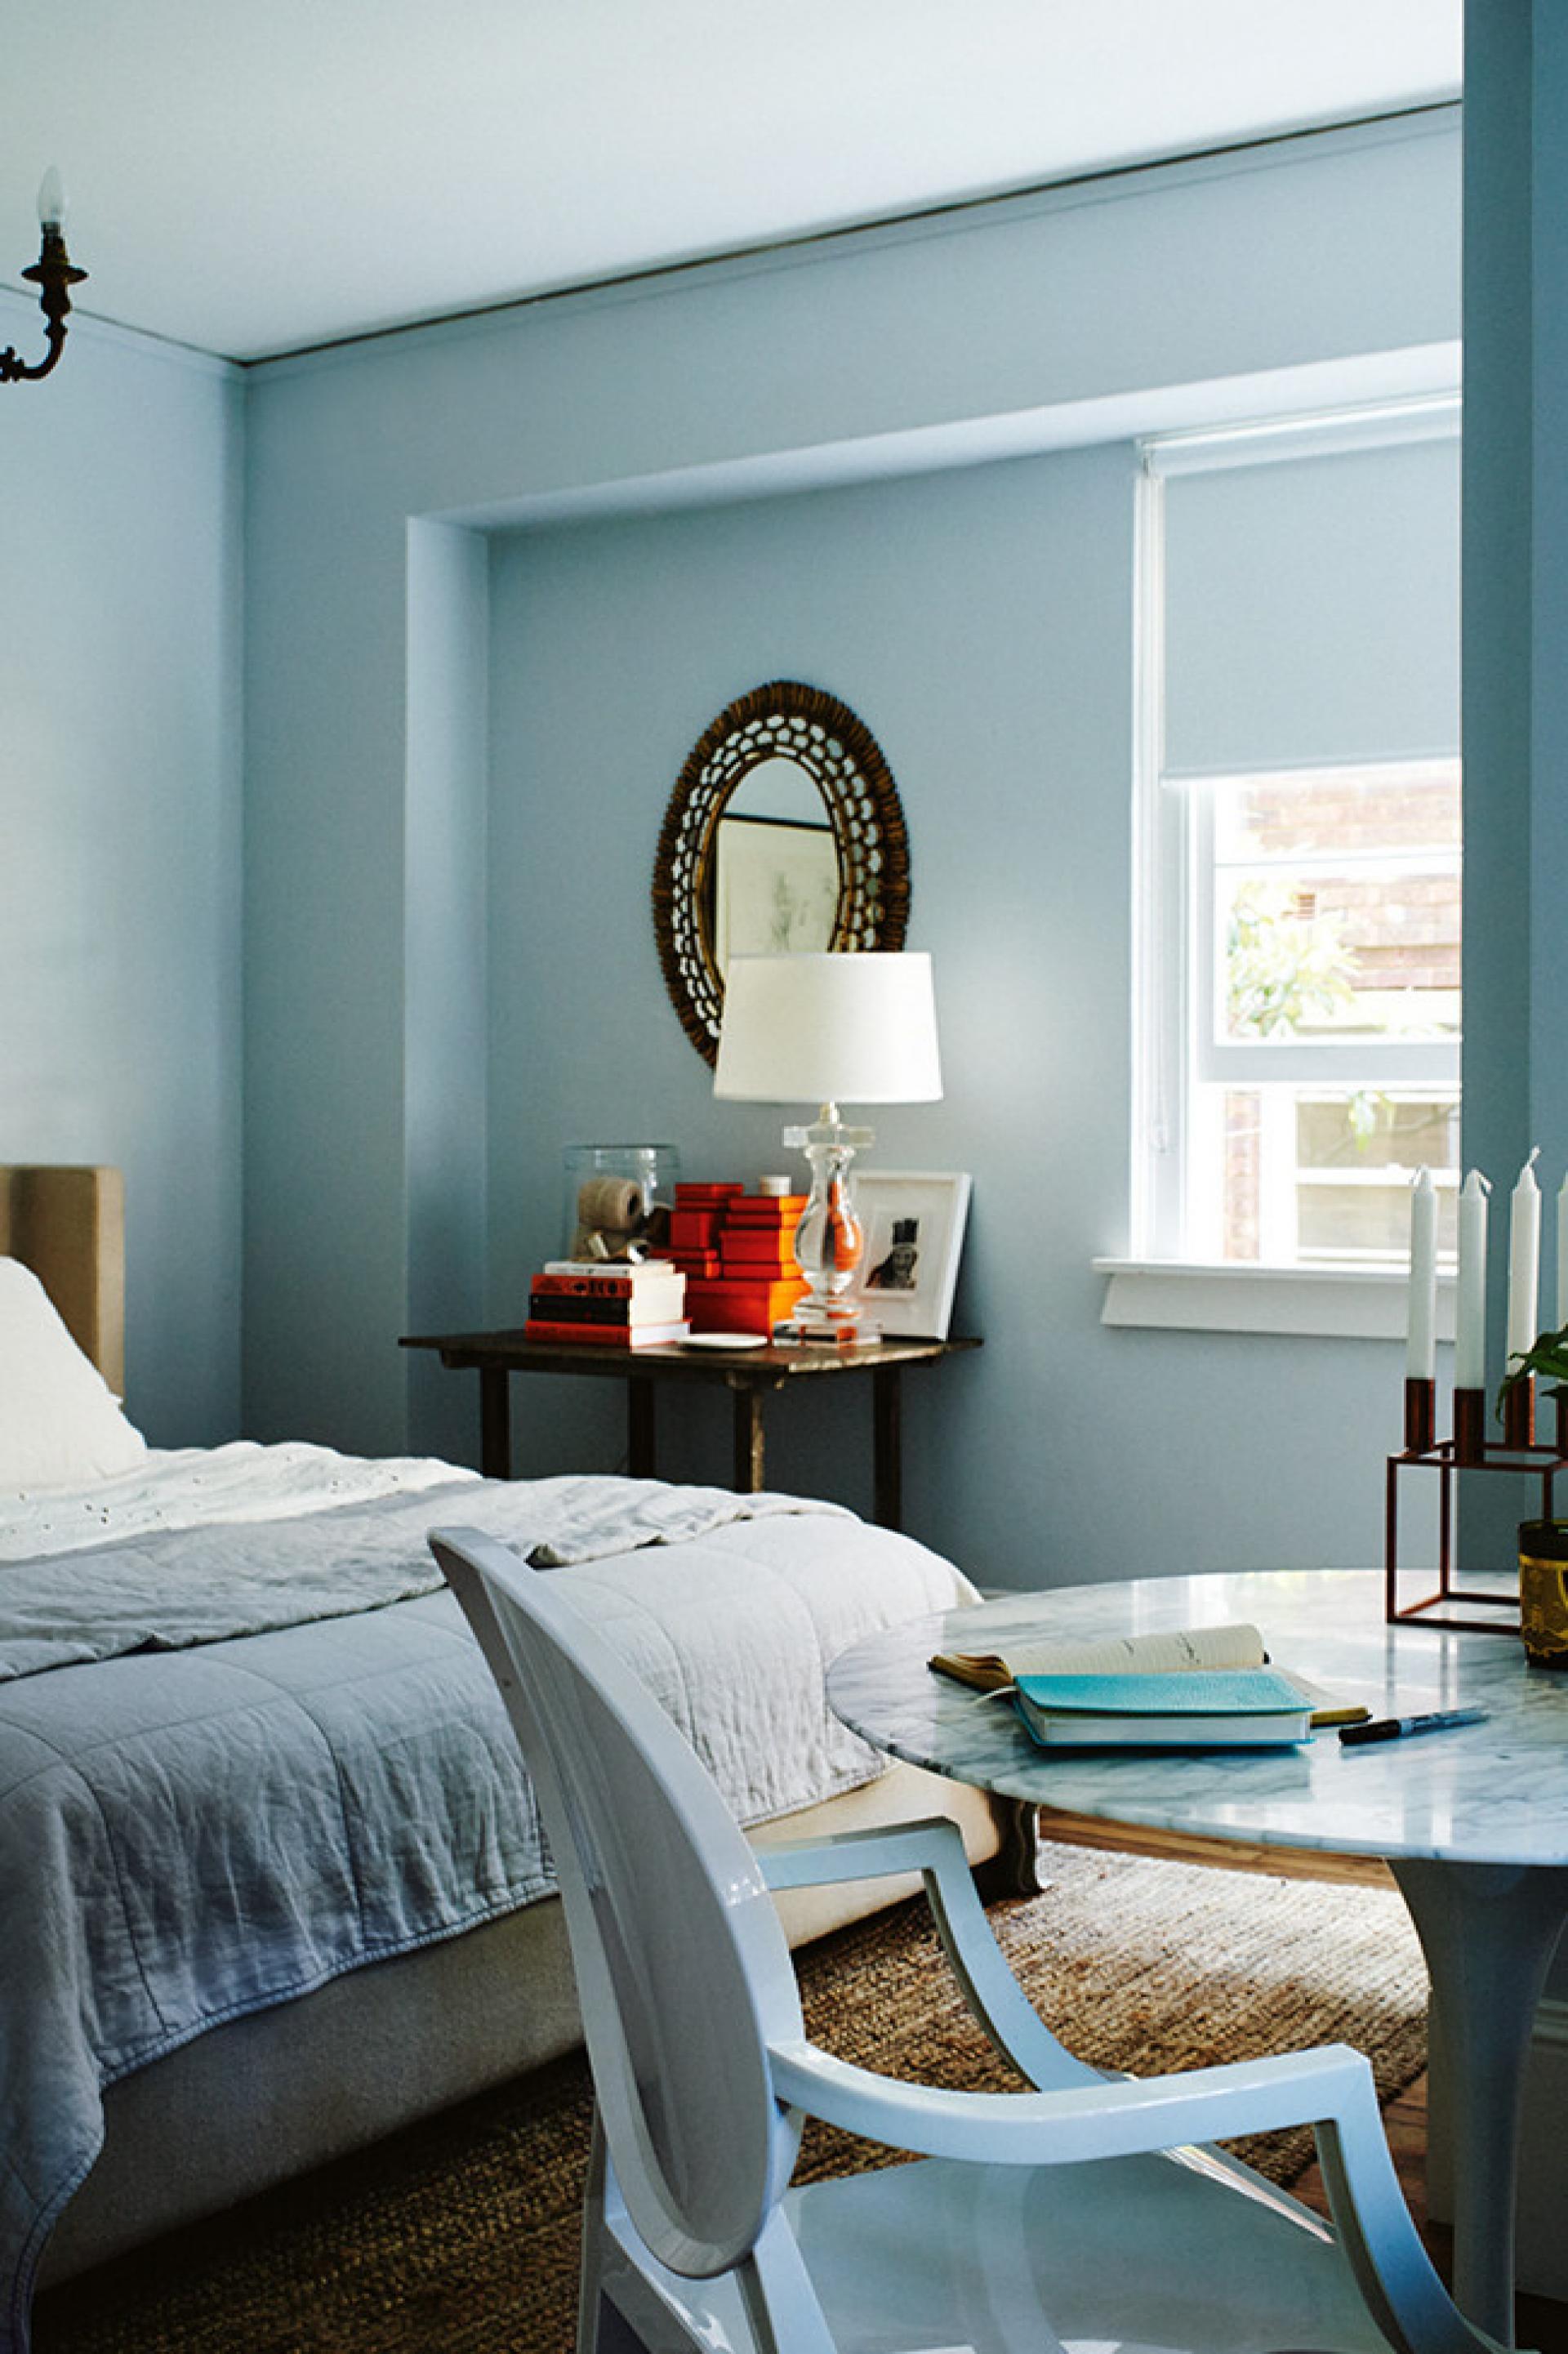 978745-1_lp-bookalil-home-sydney-bedroom-20150217094318~q75,dx1920y-u1r1g0